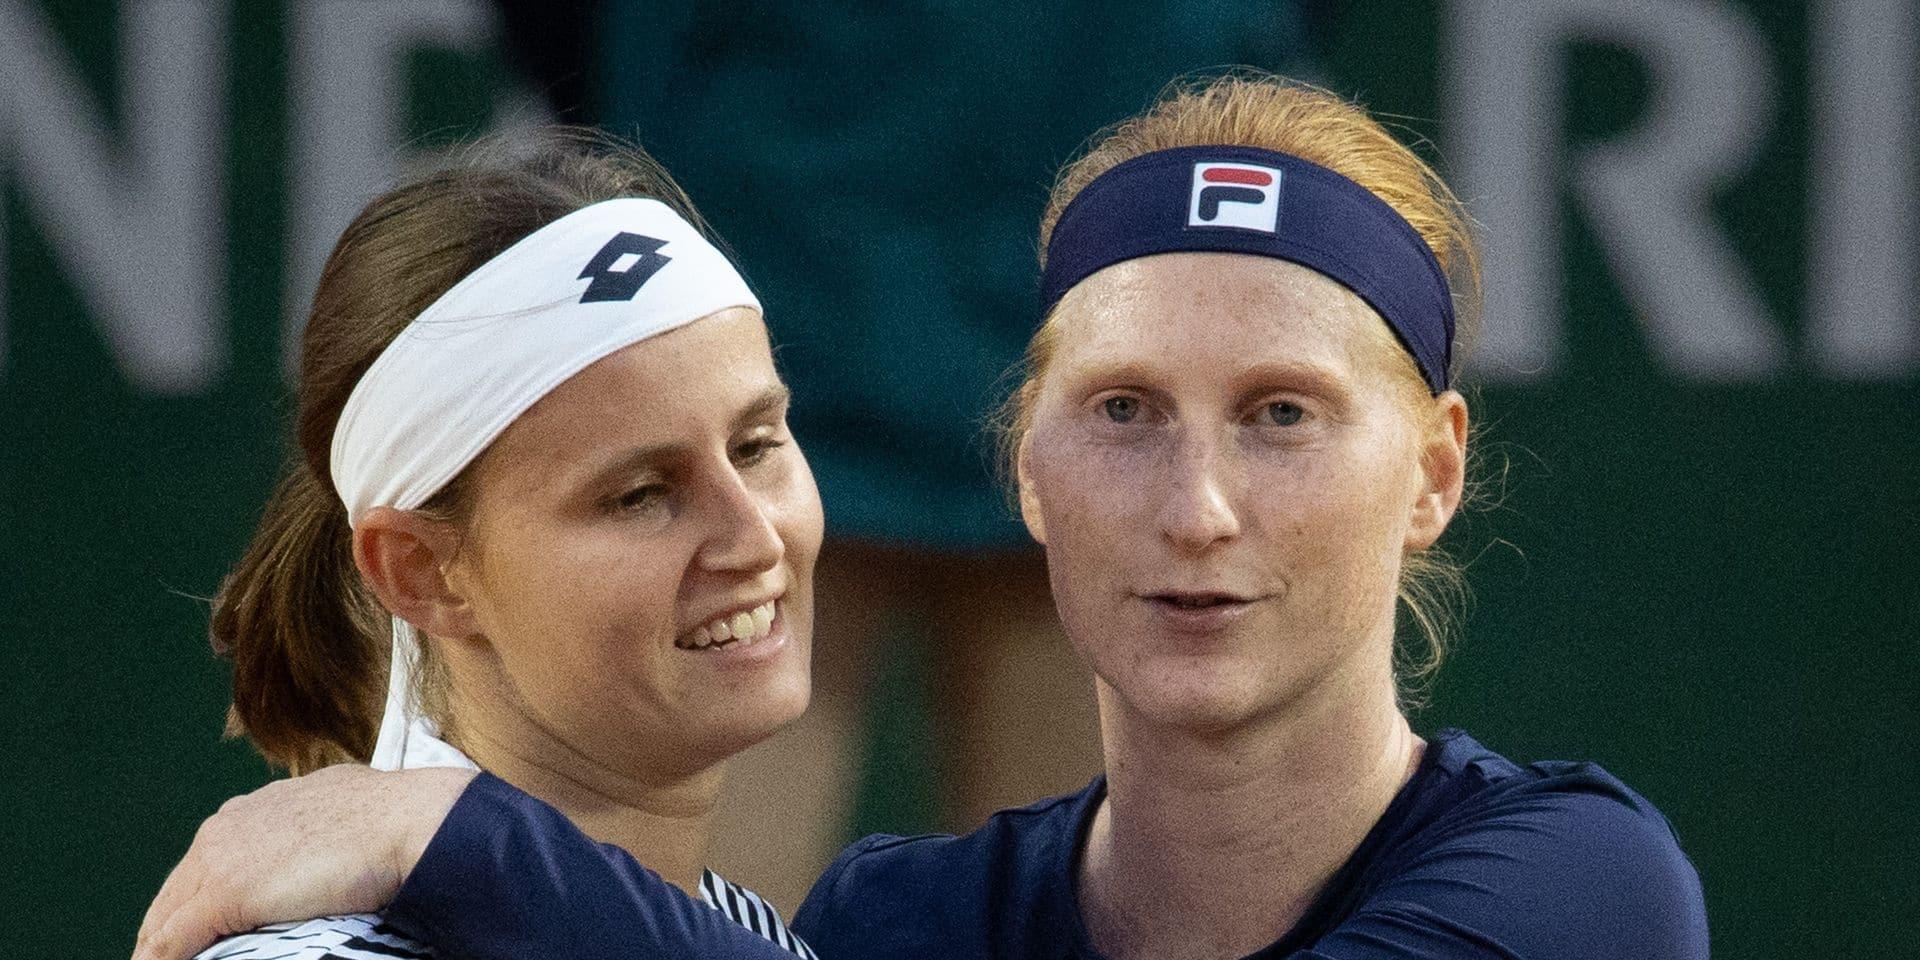 Greet Minnen rencontrera la Tchèque Krejcikova au 2e tour